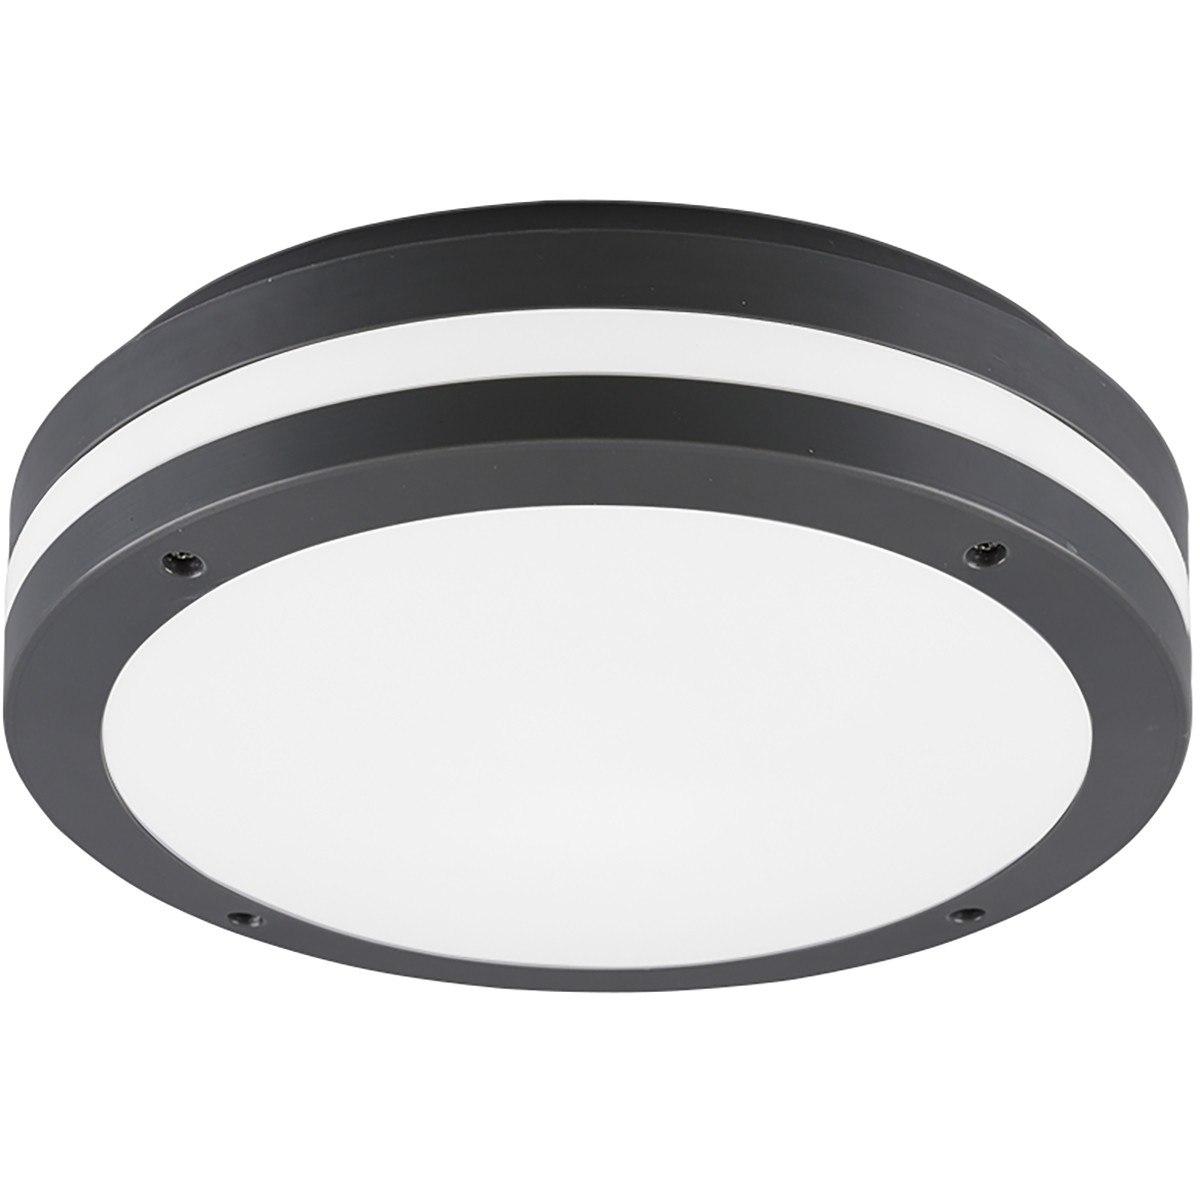 LED Plafondlamp - Trion Keraly - Opbouw Rond - Waterdicht - 12W - Warm Wit 3000K - Mat Zwart - Kunst